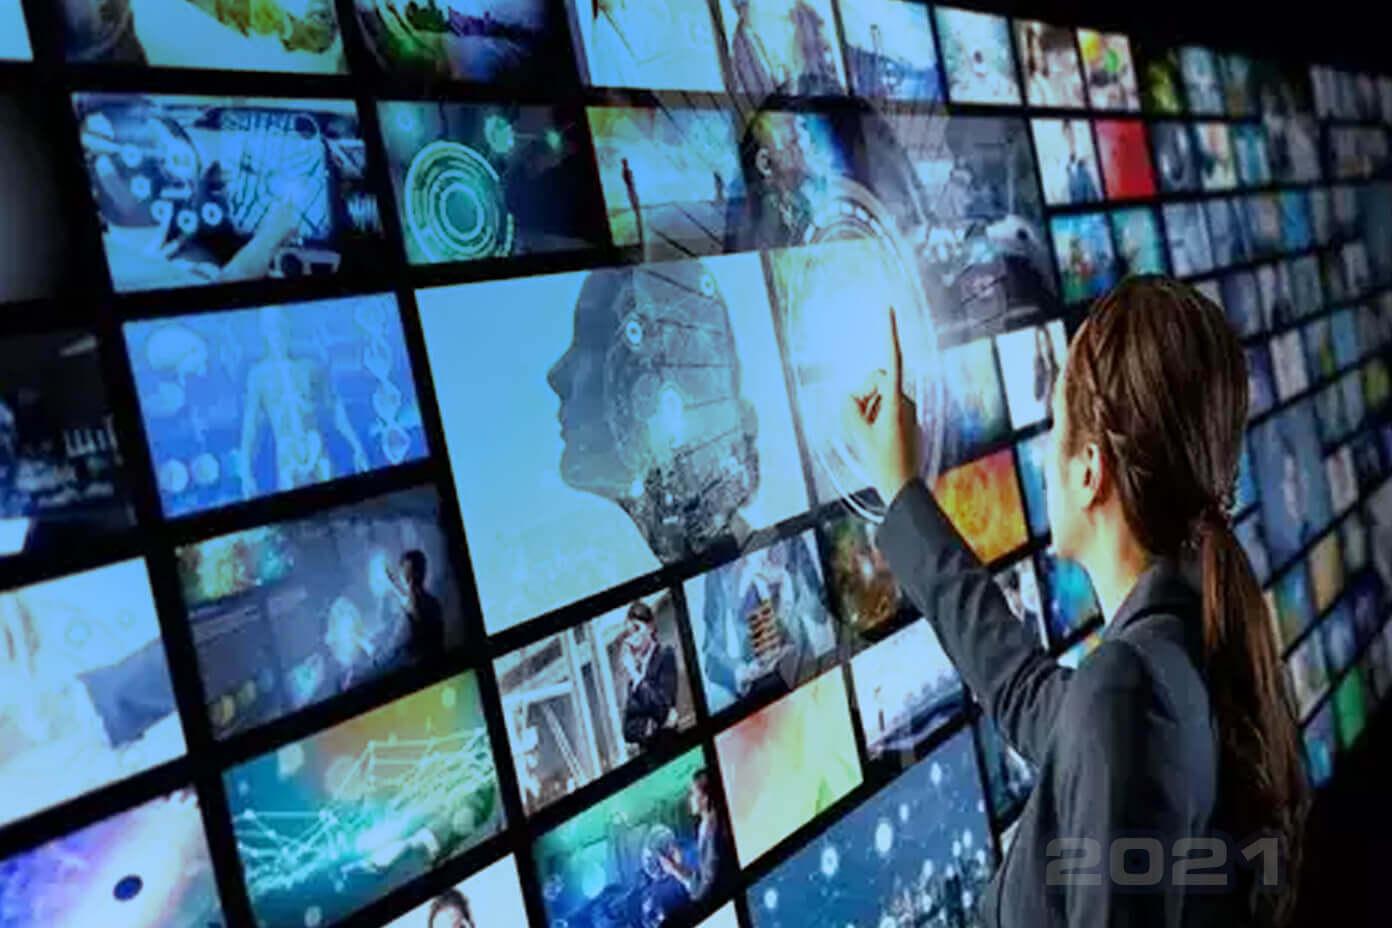 Digital Technology Outlook for Media & Entertainment Industry